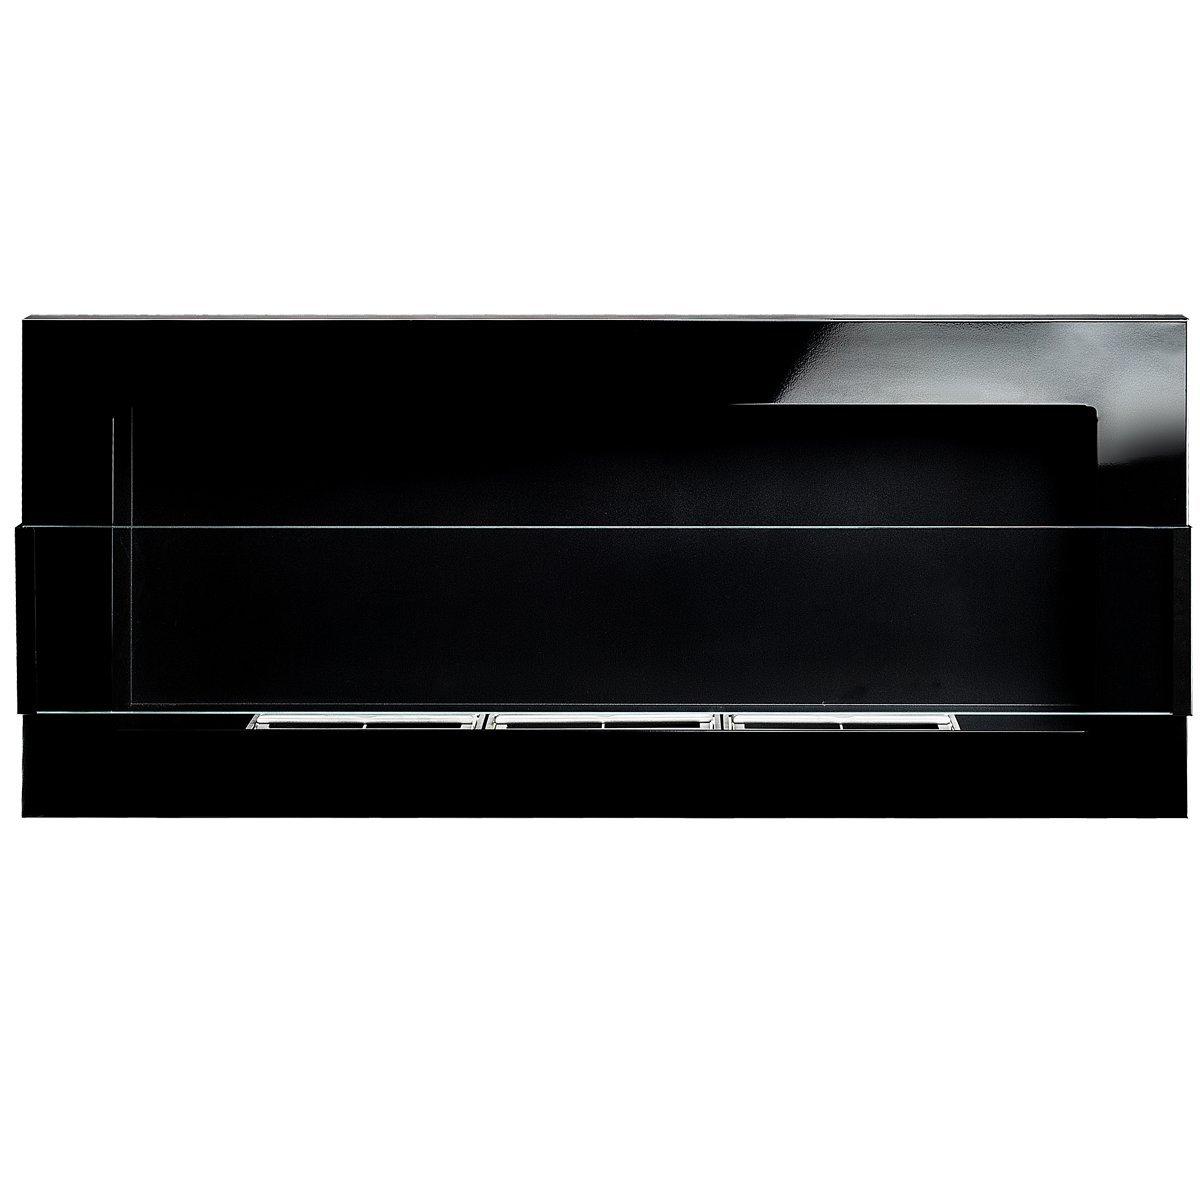 Flame – Wandkamin   Ethanolkamin (65 x 40 40 40 cm, Inox) 662216